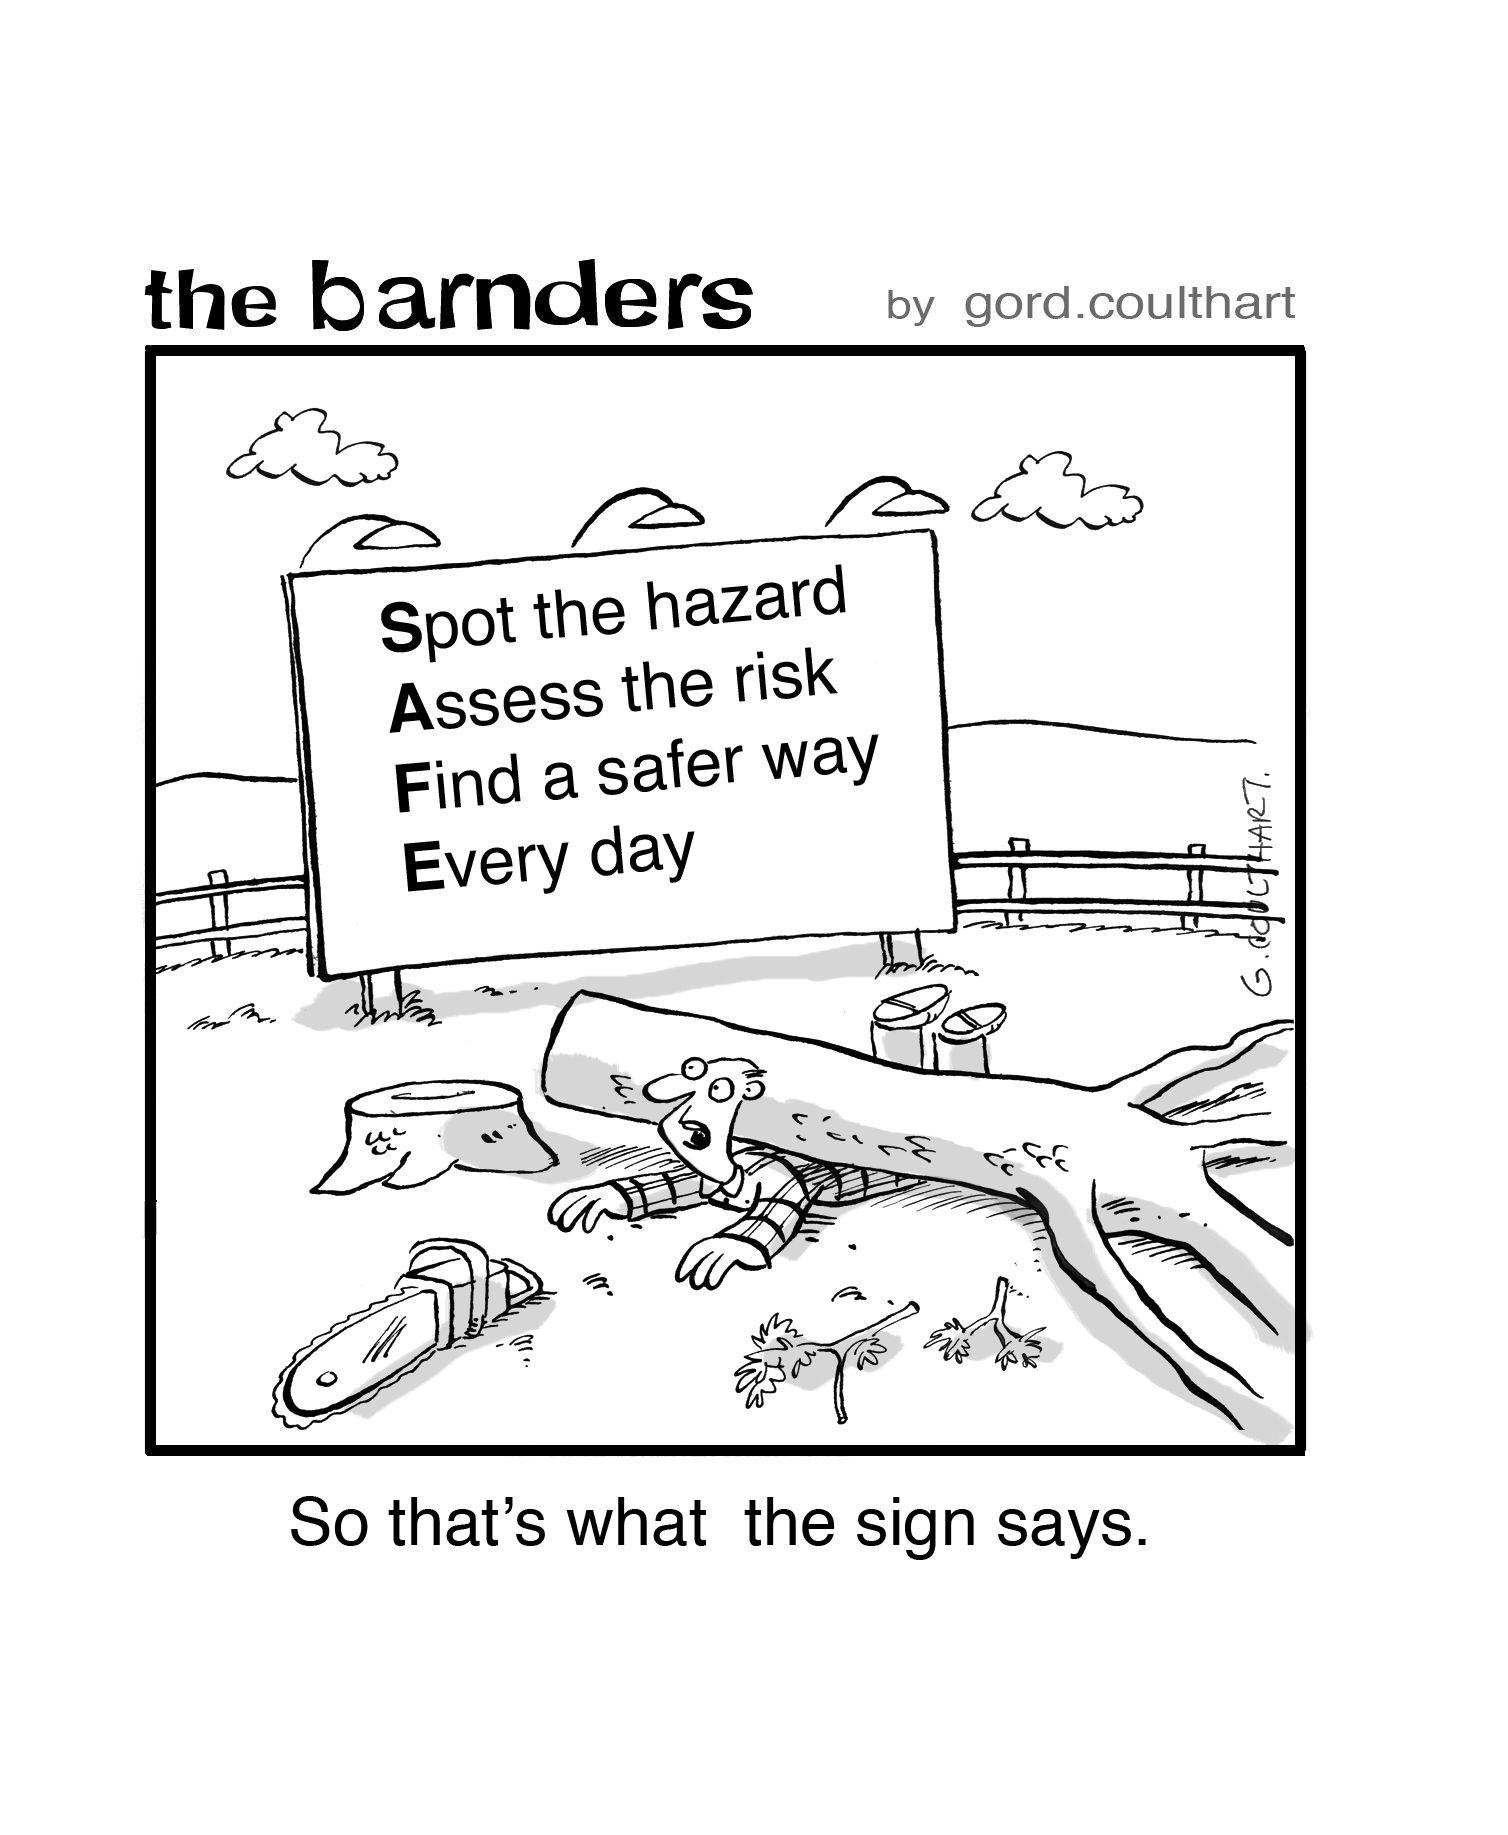 Spot The Hazard Sess The Risk Nd A Safer Way